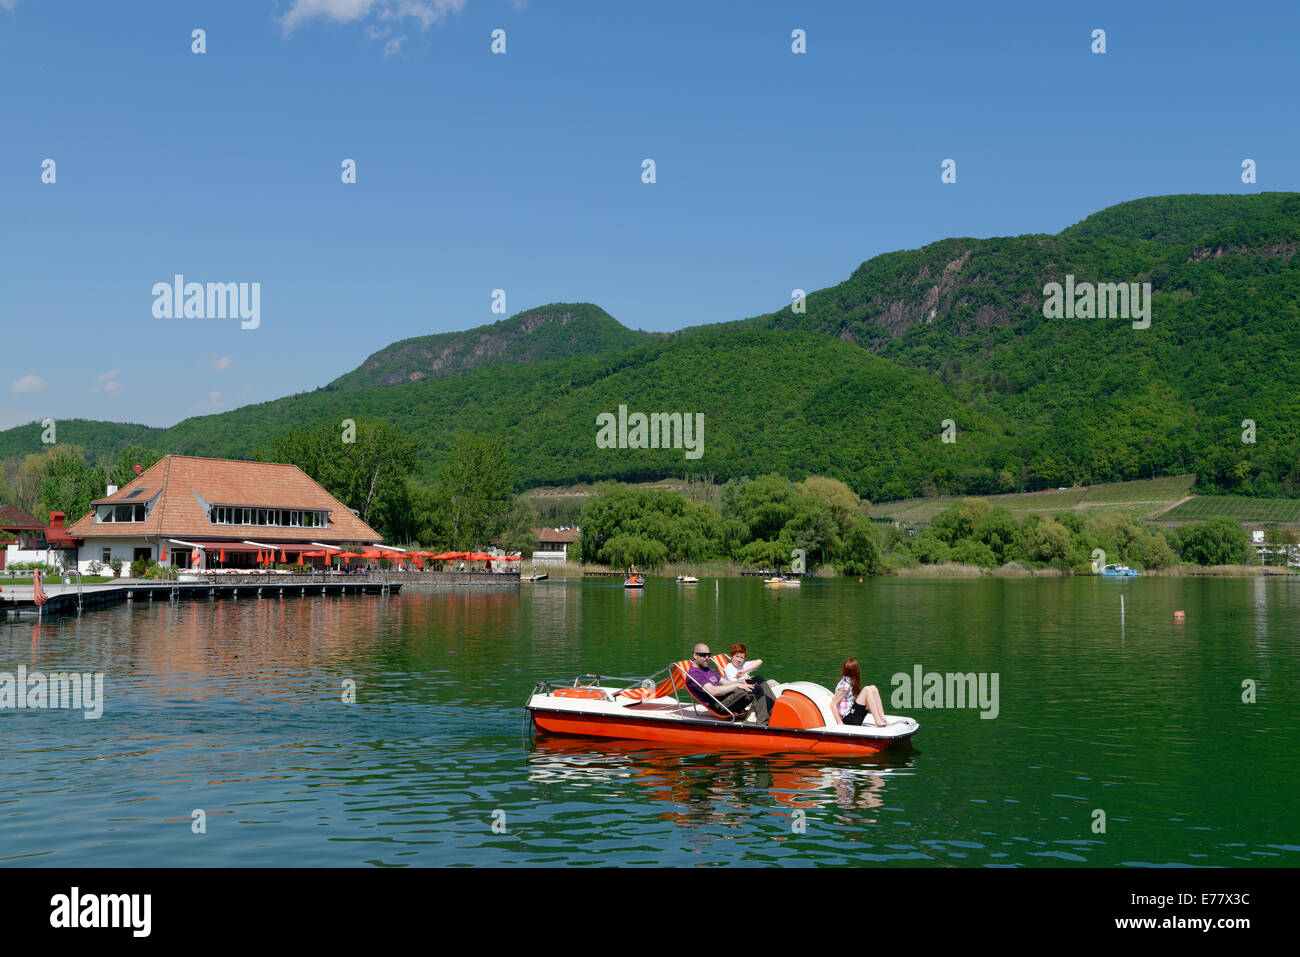 St. Josef on Kalterer See, Kaltern, Überetsch, South Tyrolean Unterland, South Tyrol, Italy - Stock Image